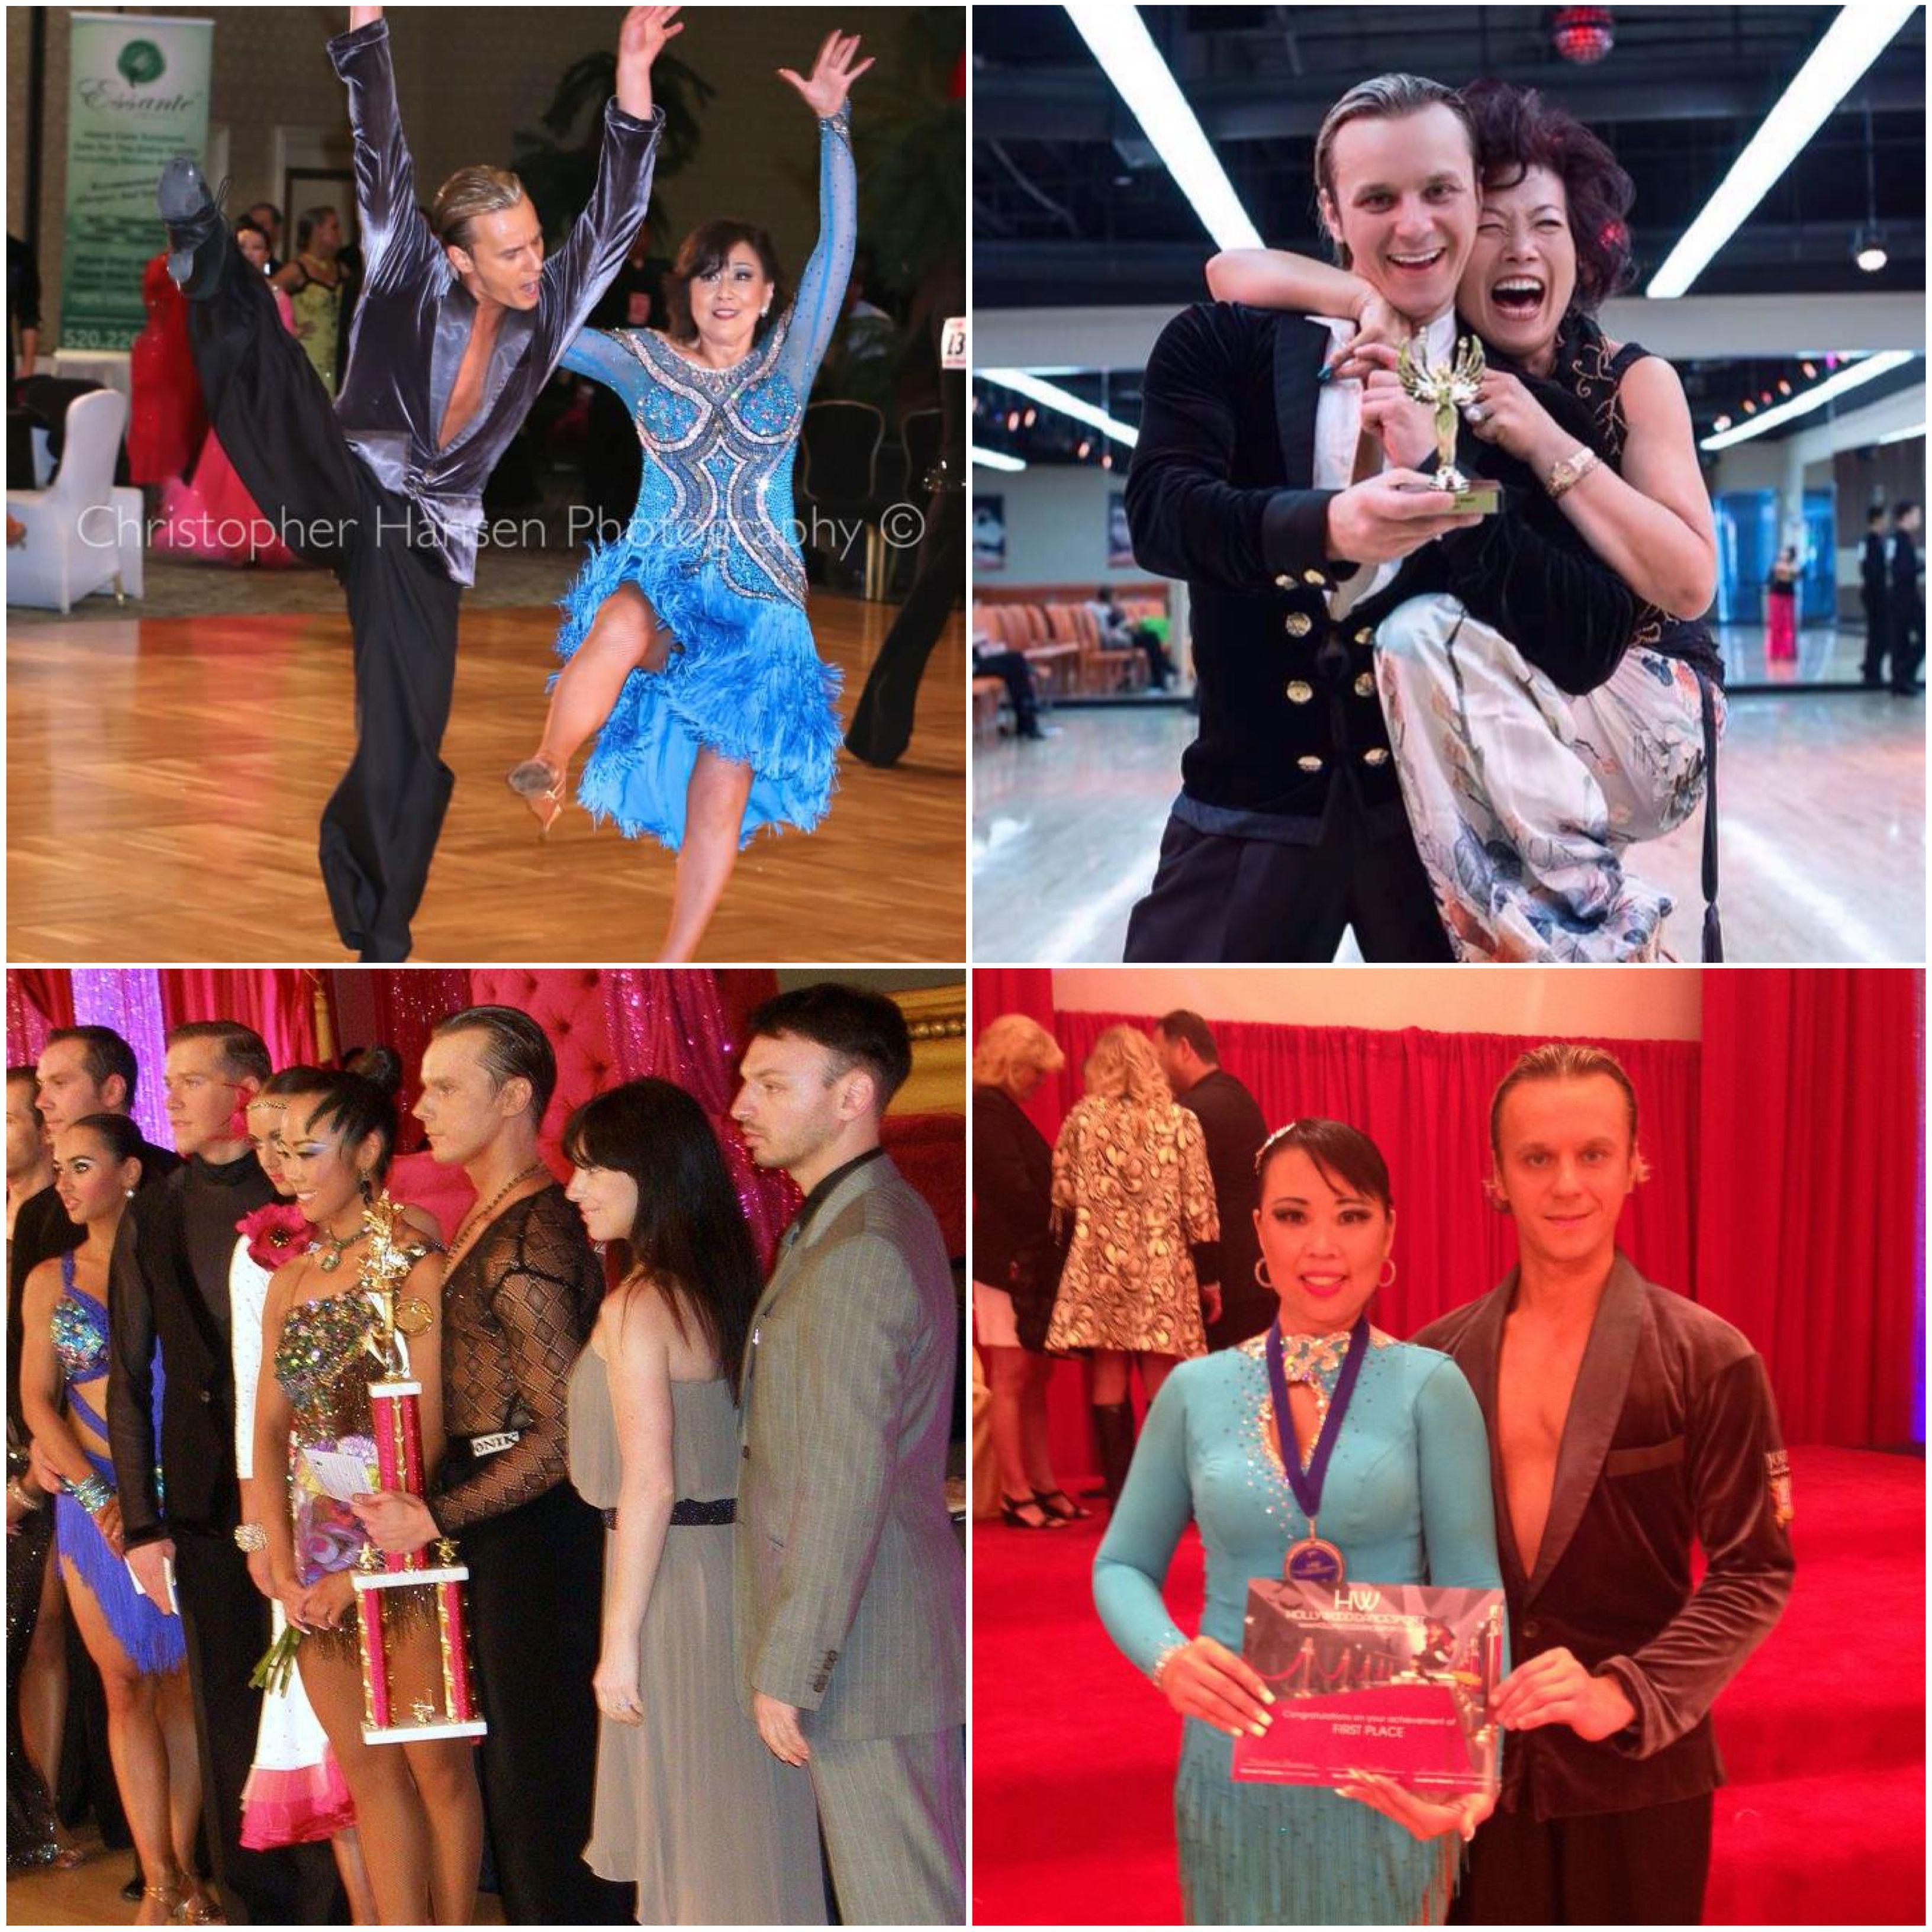 Ballroom Dance Lessons In Los Angeles With Oleg Astakhov